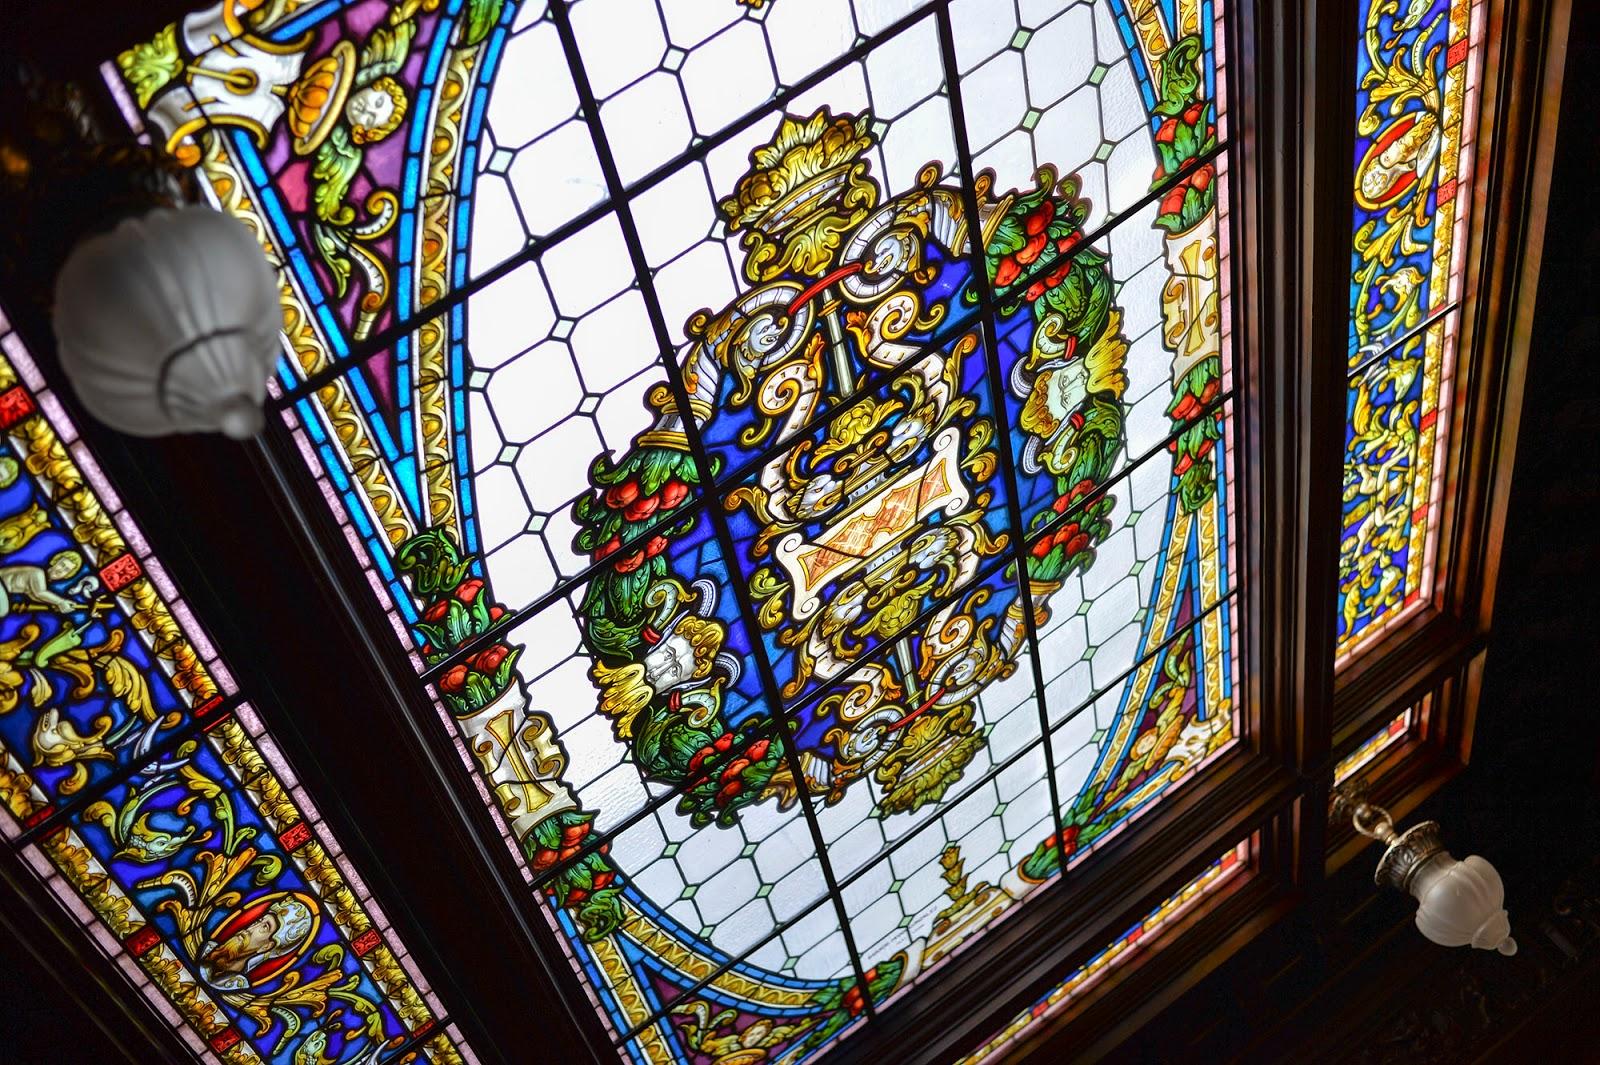 vidriera stained glass window leon spain museo museum emigracion leonesa corona coronita beer